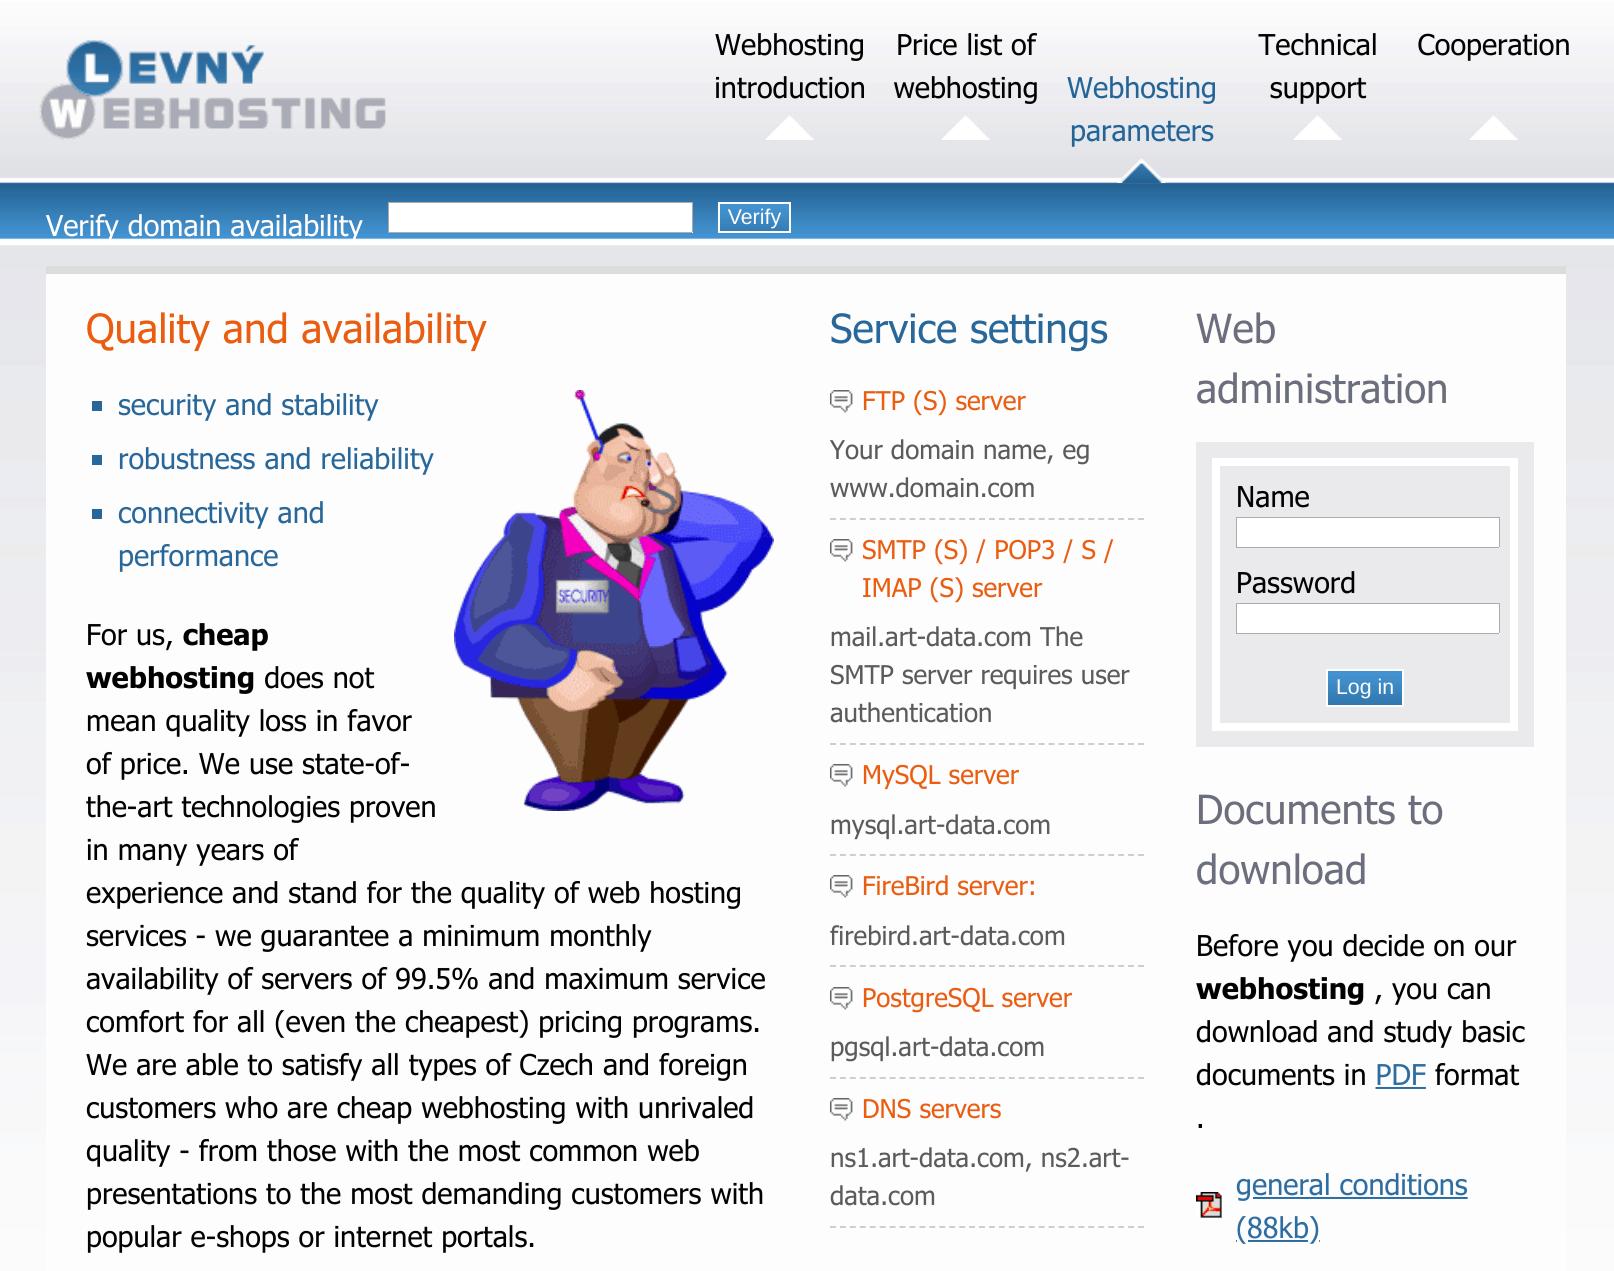 Levny Webhosting